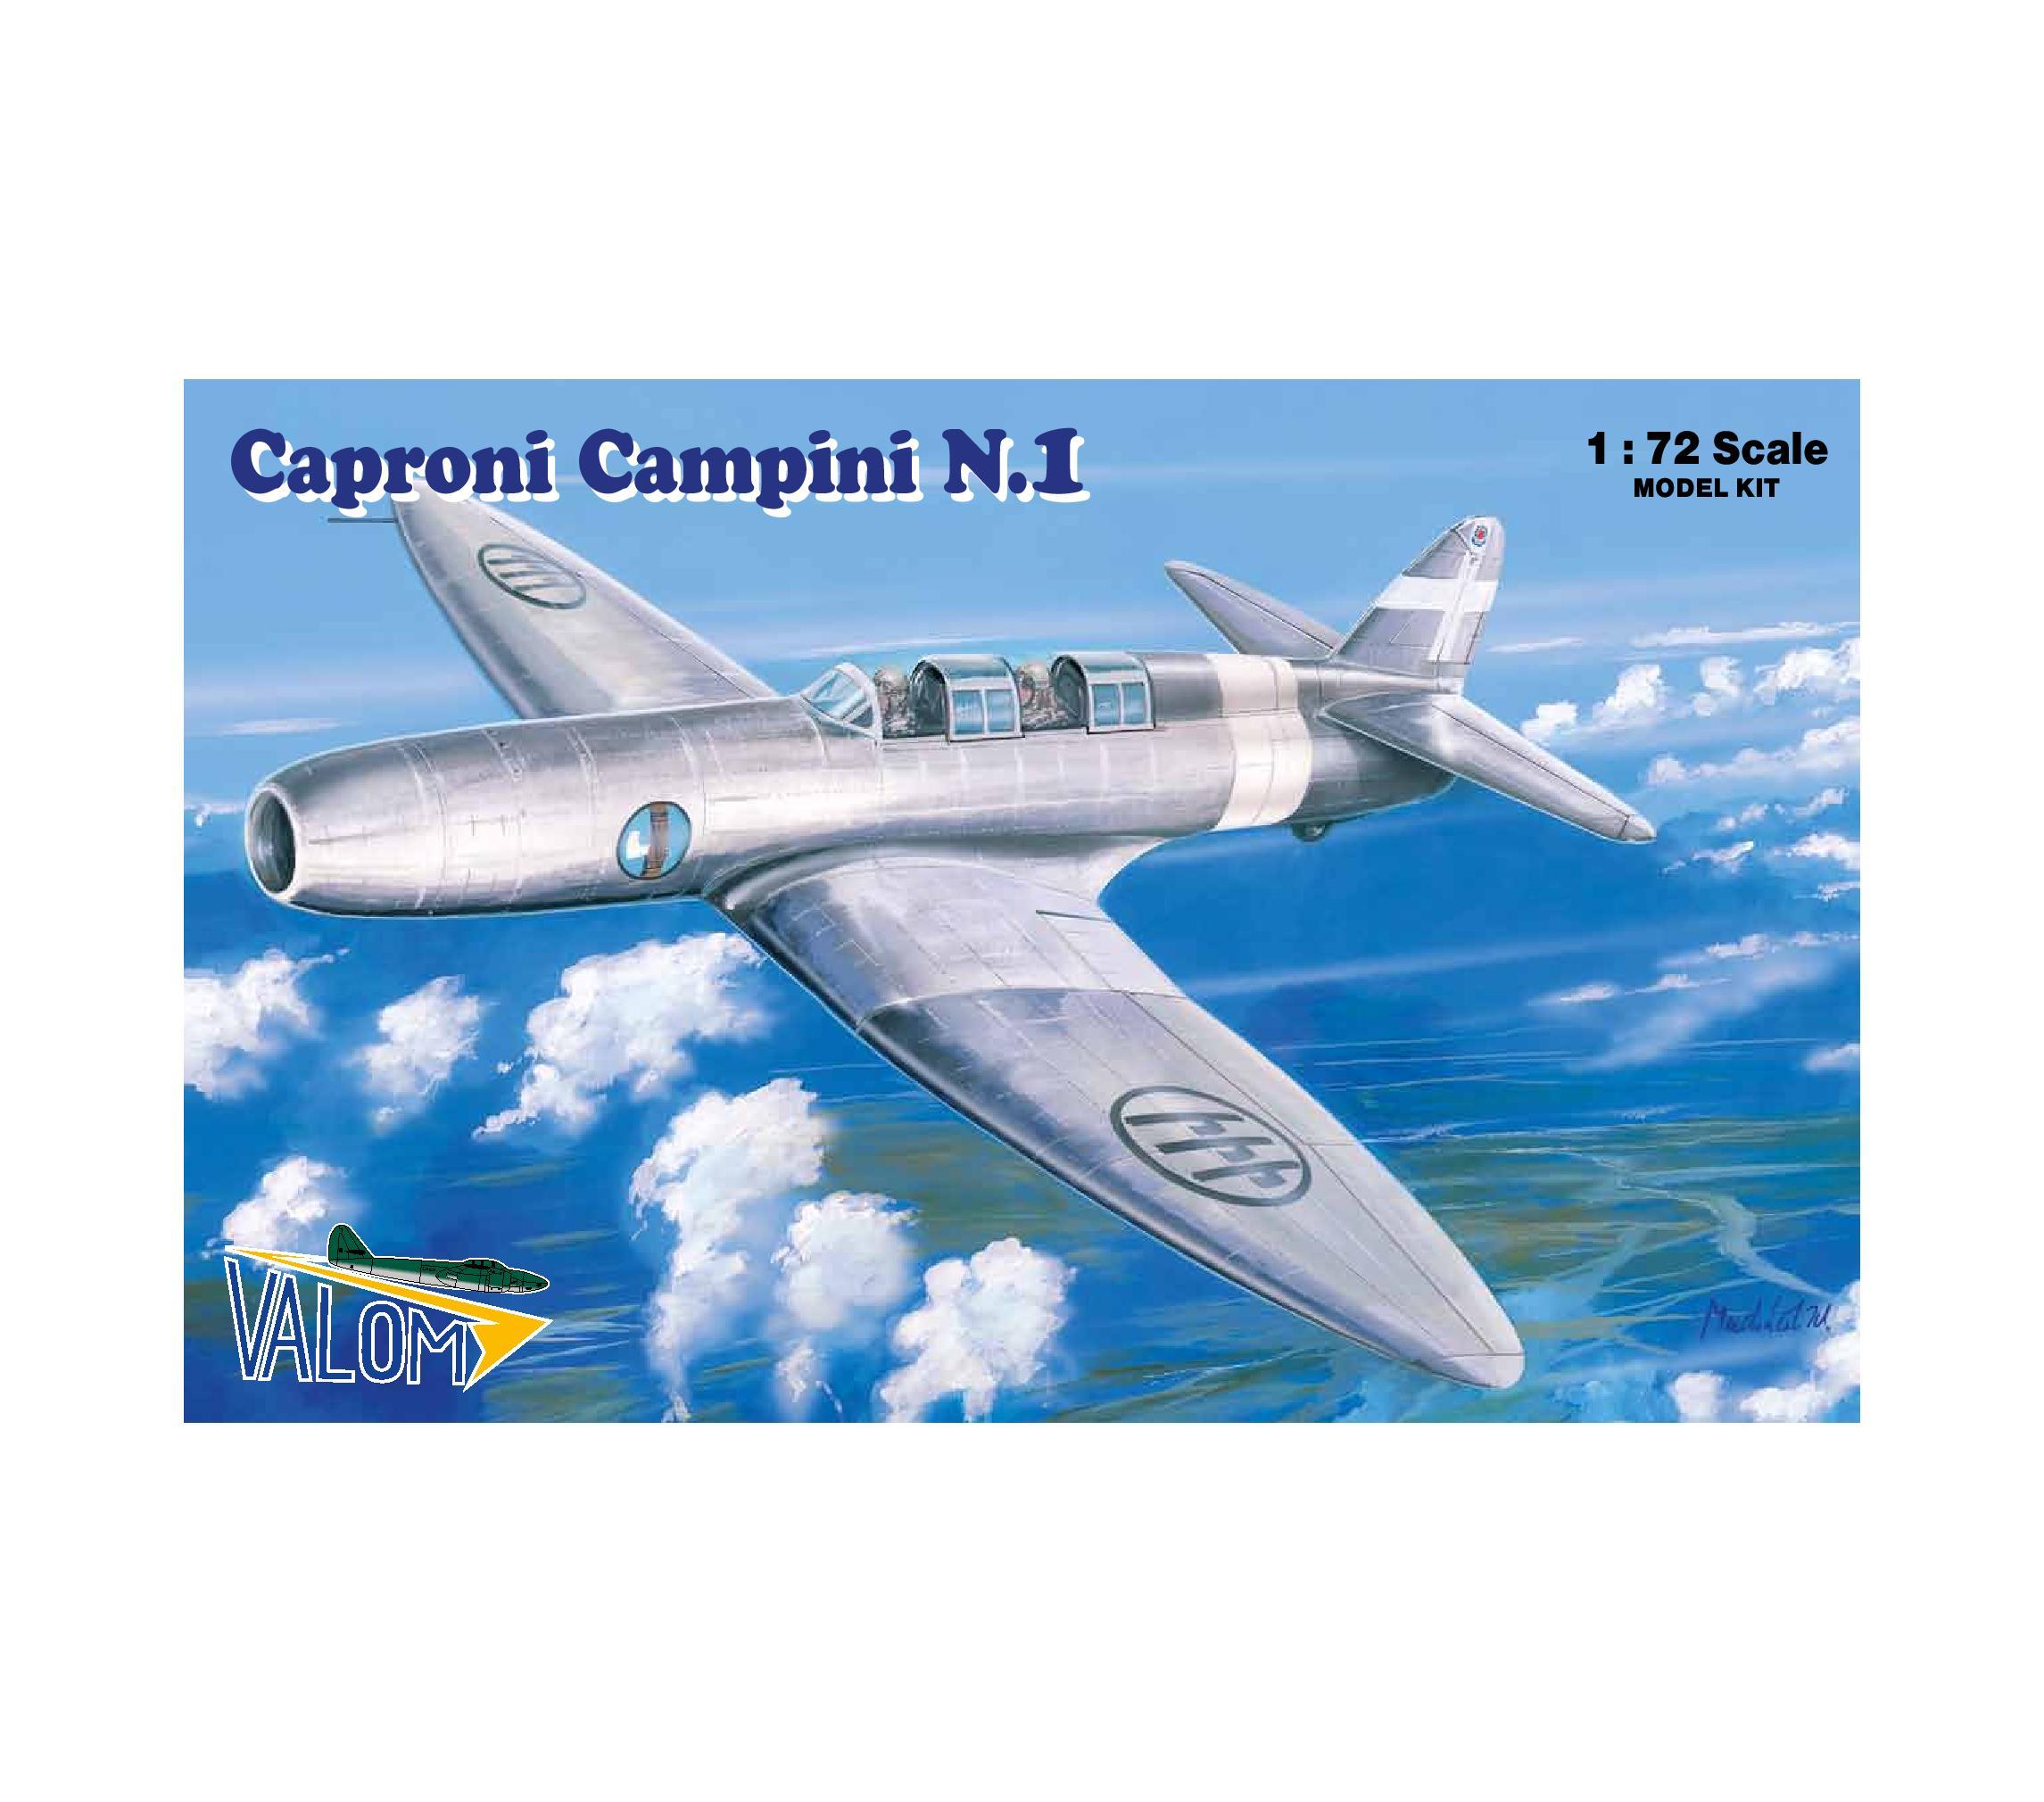 Valom Caproni Campini N.1